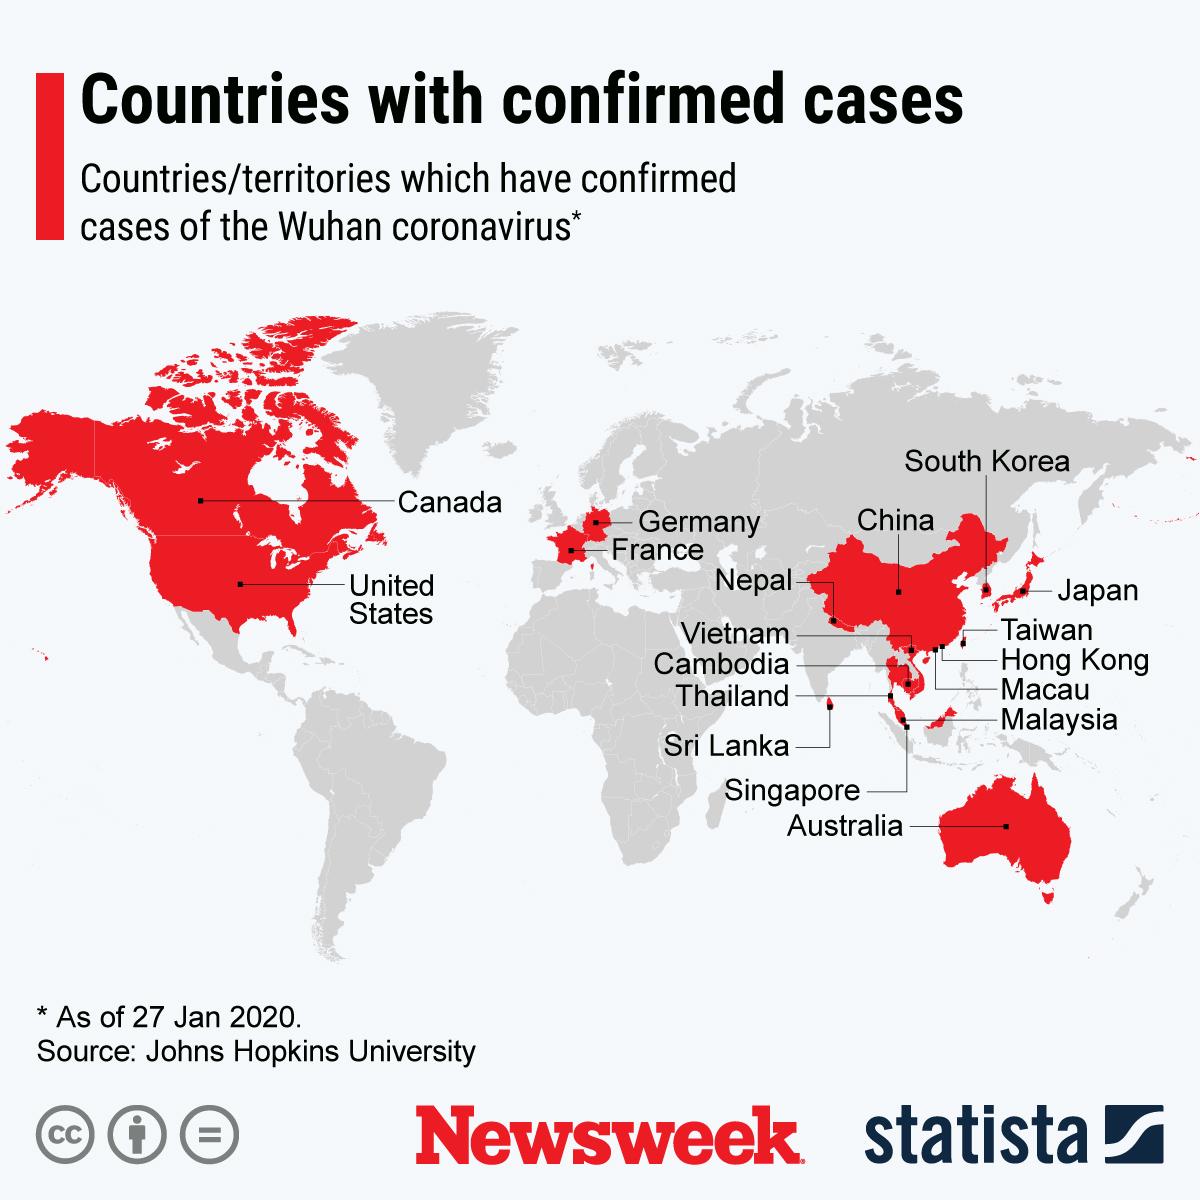 https://d.newsweek.com/en/full/1563475/coronavirus-statista-spread-countries.jpg